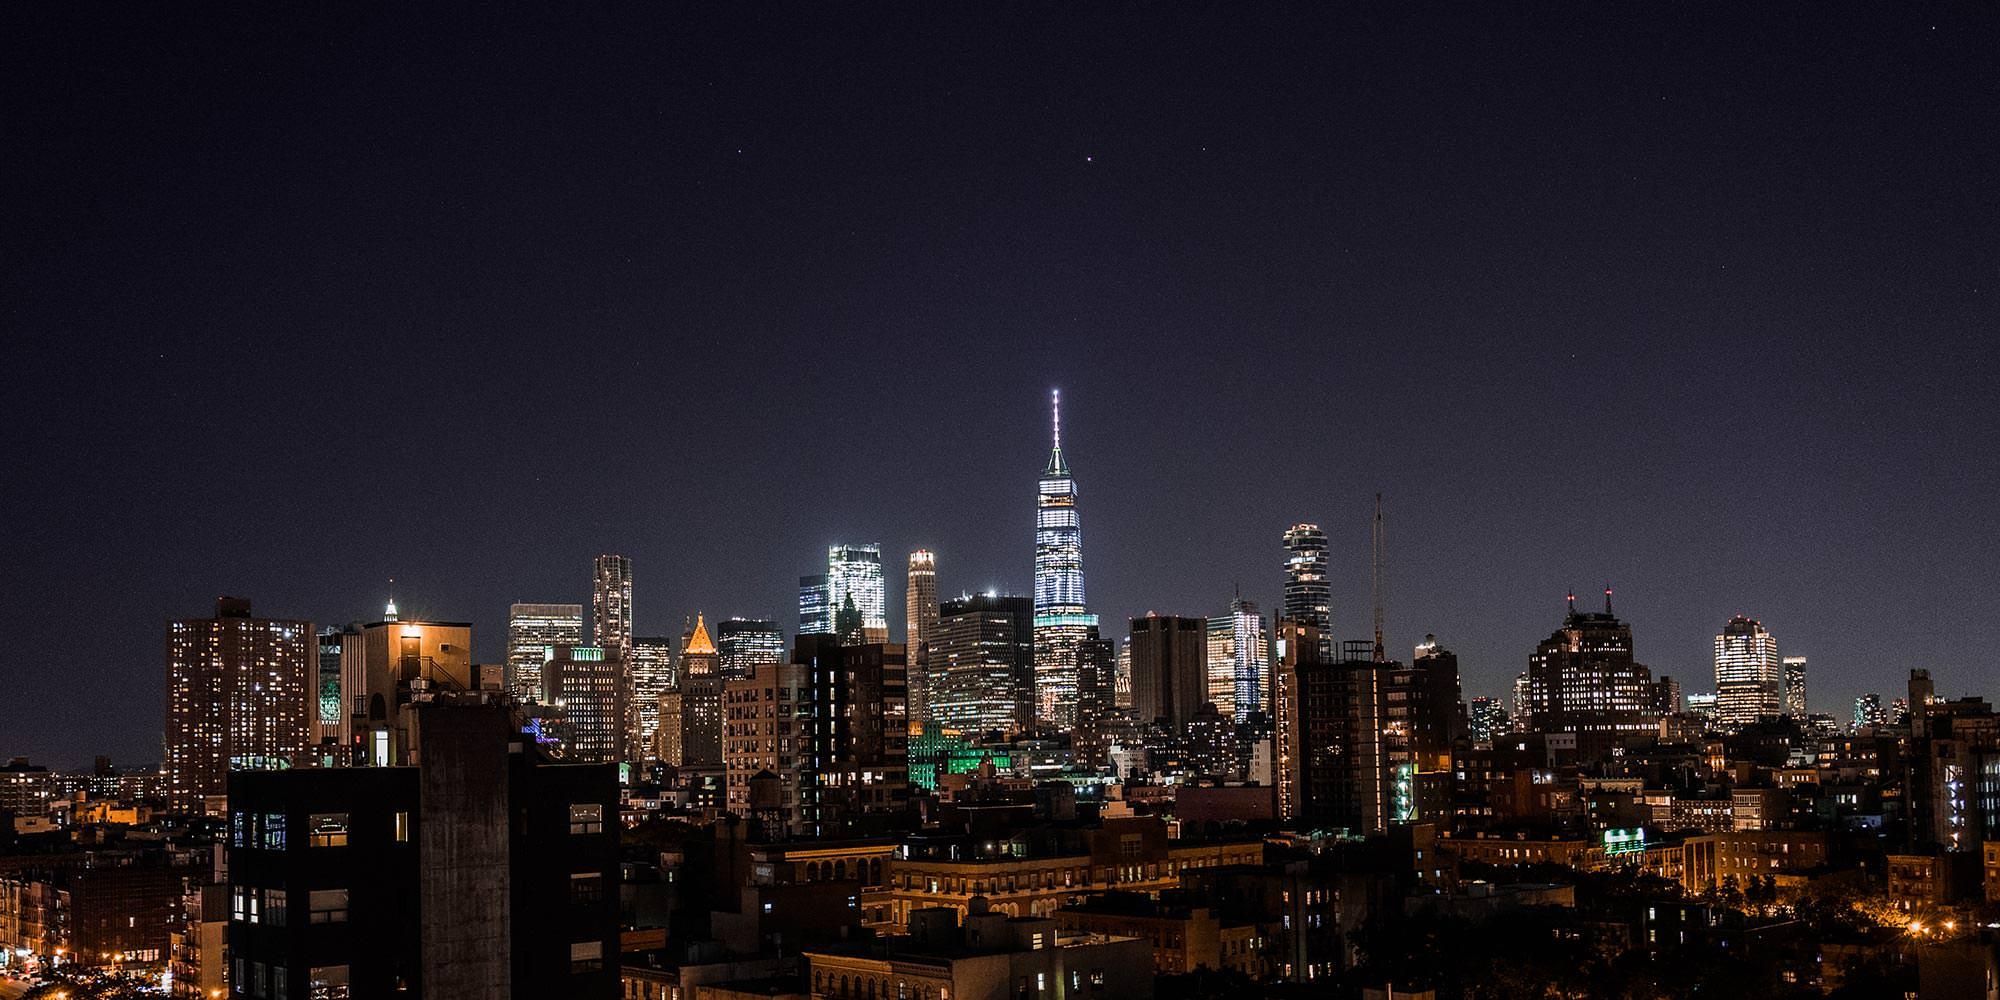 Skyline New York by night